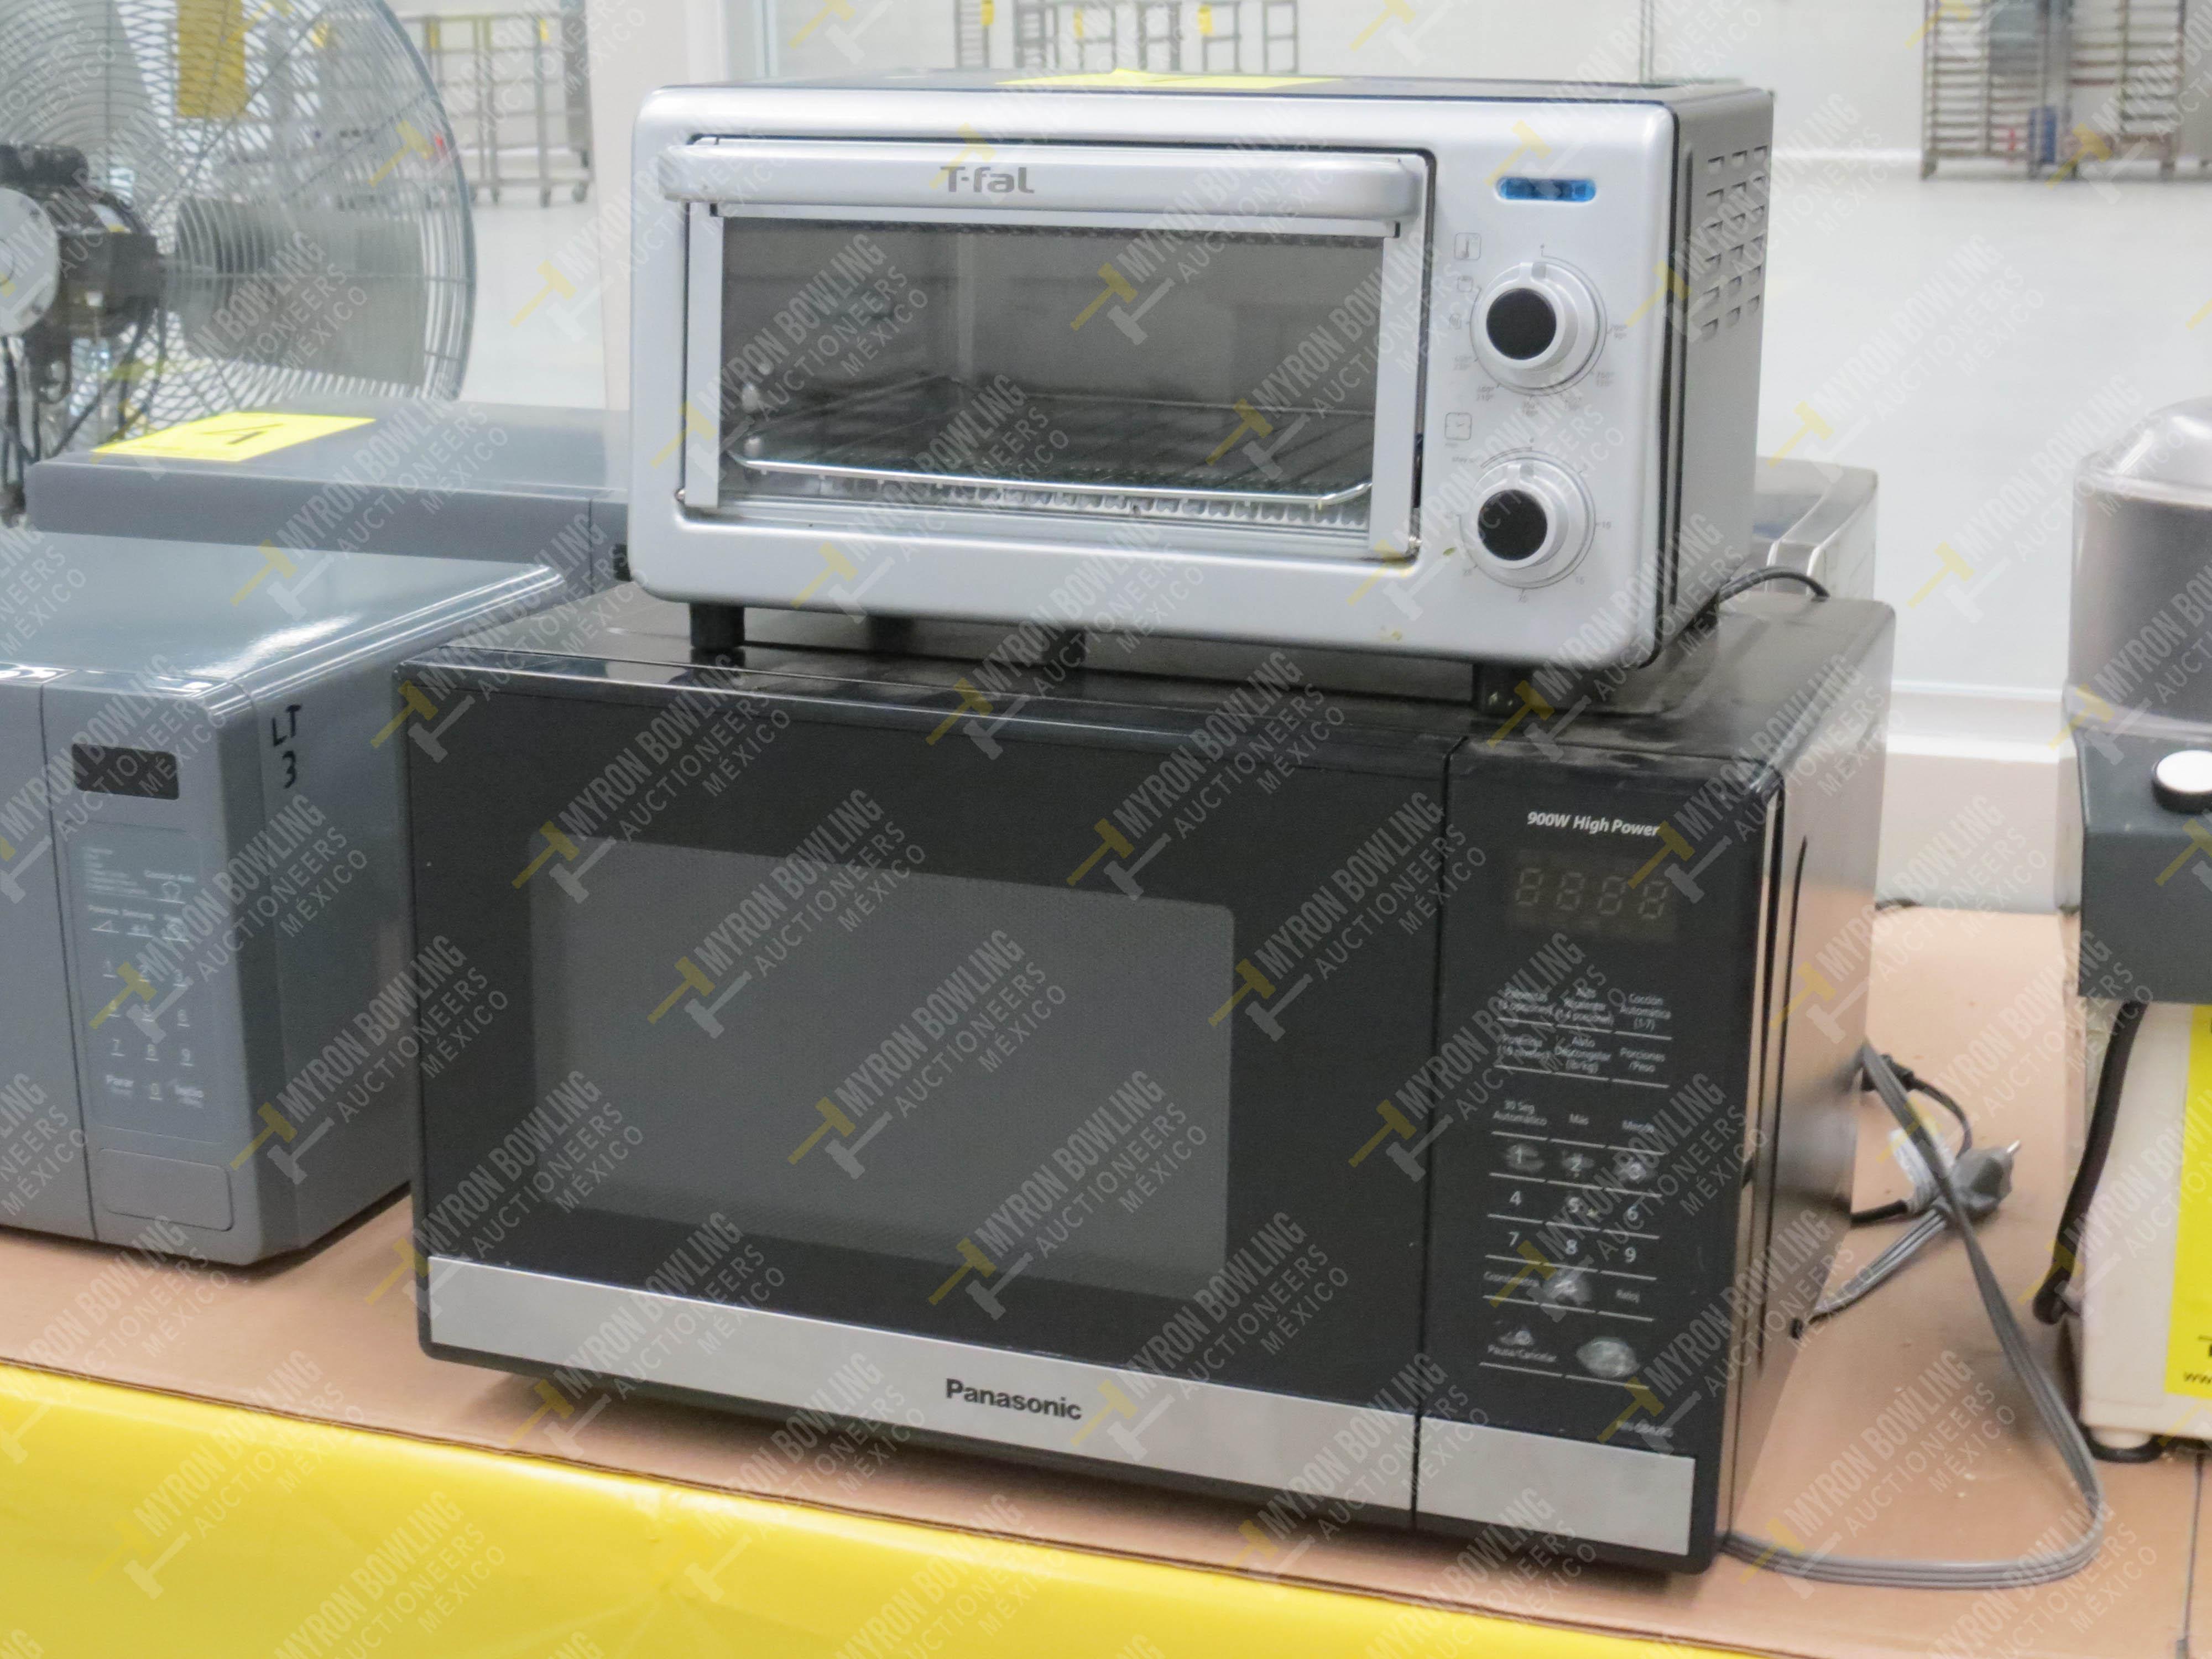 1 Horno eléctrico marca T-fal, Modelo OF160850 No. de Serie T066 y 1 Horno de microondas - Image 5 of 5